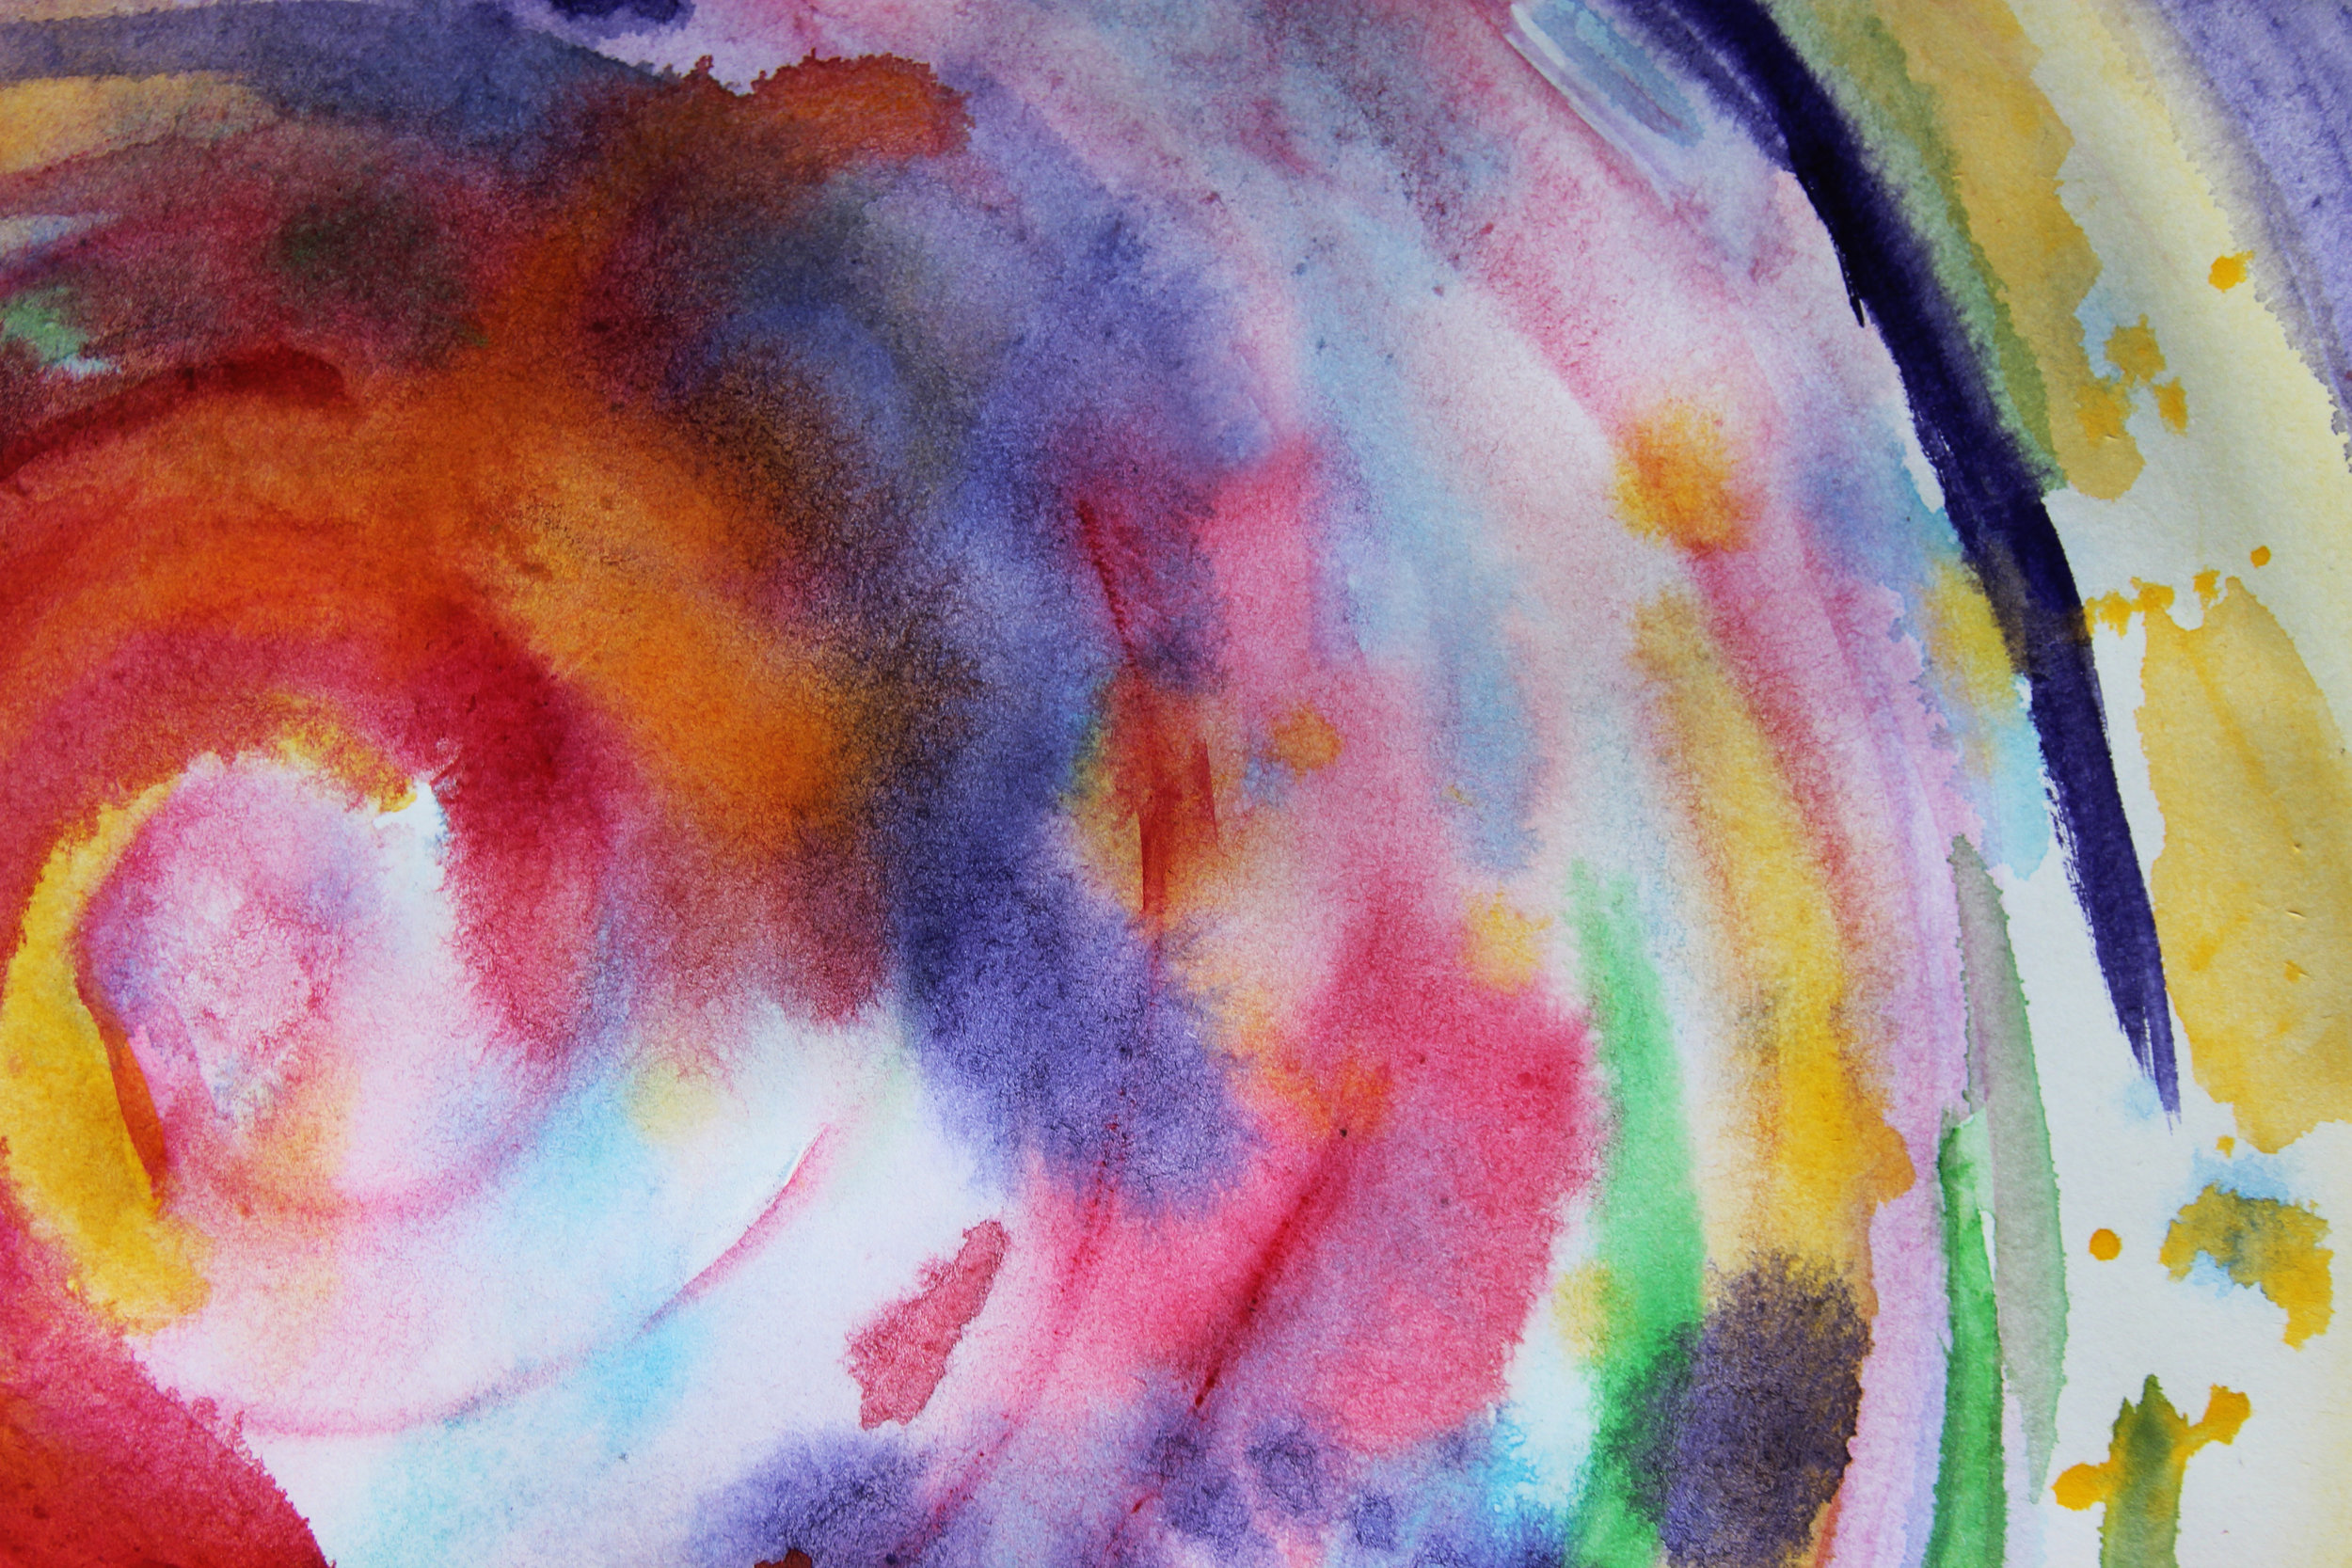 Happy Hour Meditation* - Friday, August 11 3:30 - 4:30 p.m.Vandalia Tower, Suite 210 / *Free!